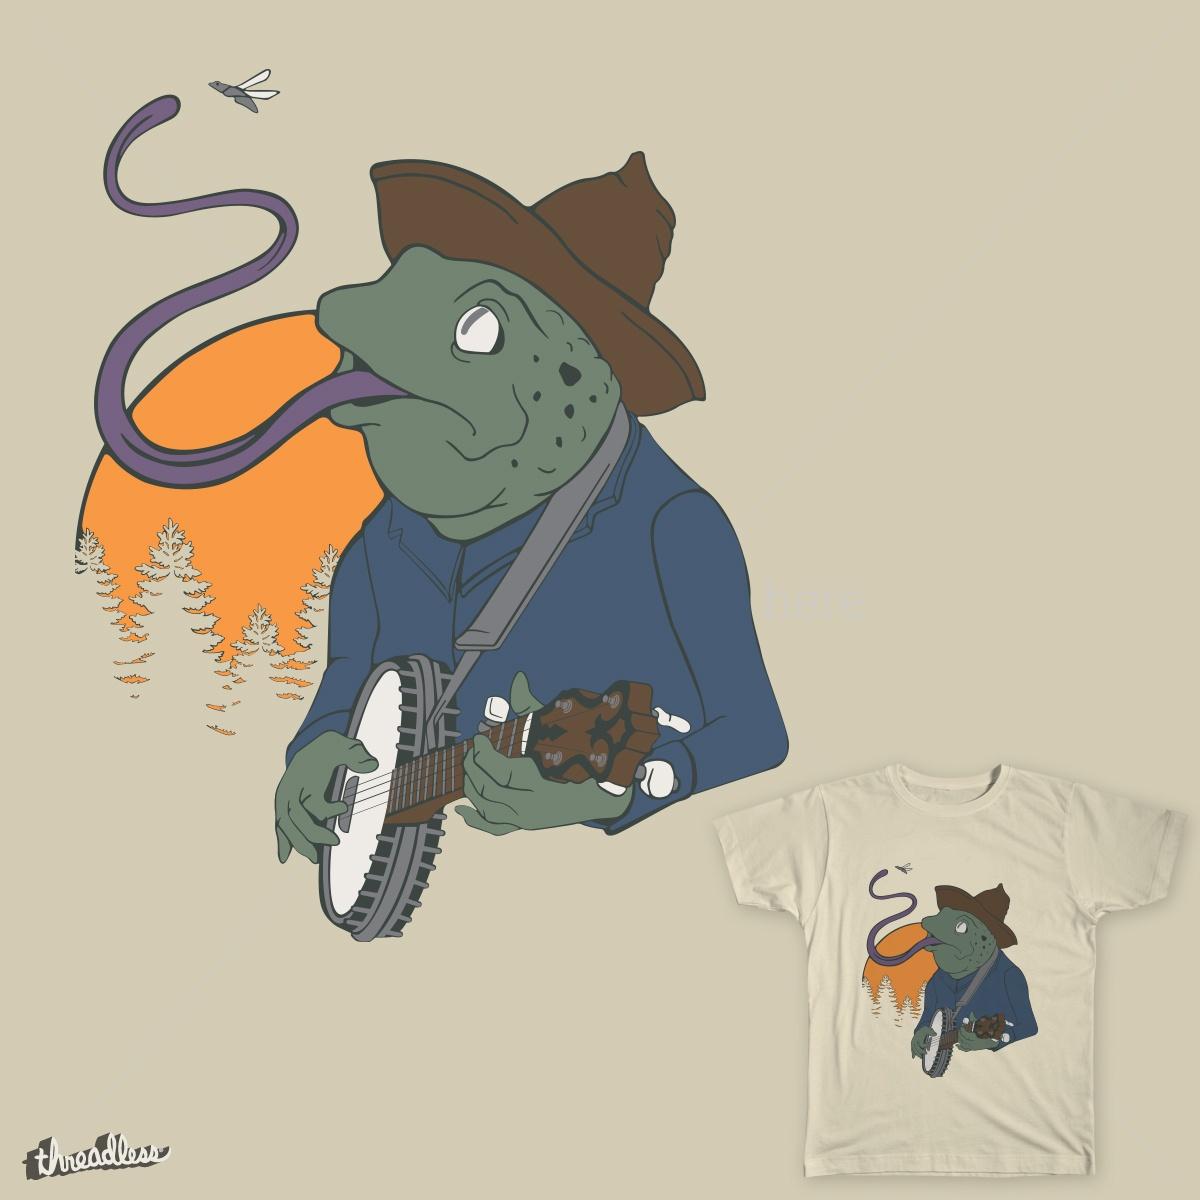 Southern Frog Jingle  by Alex_Pera on Threadless